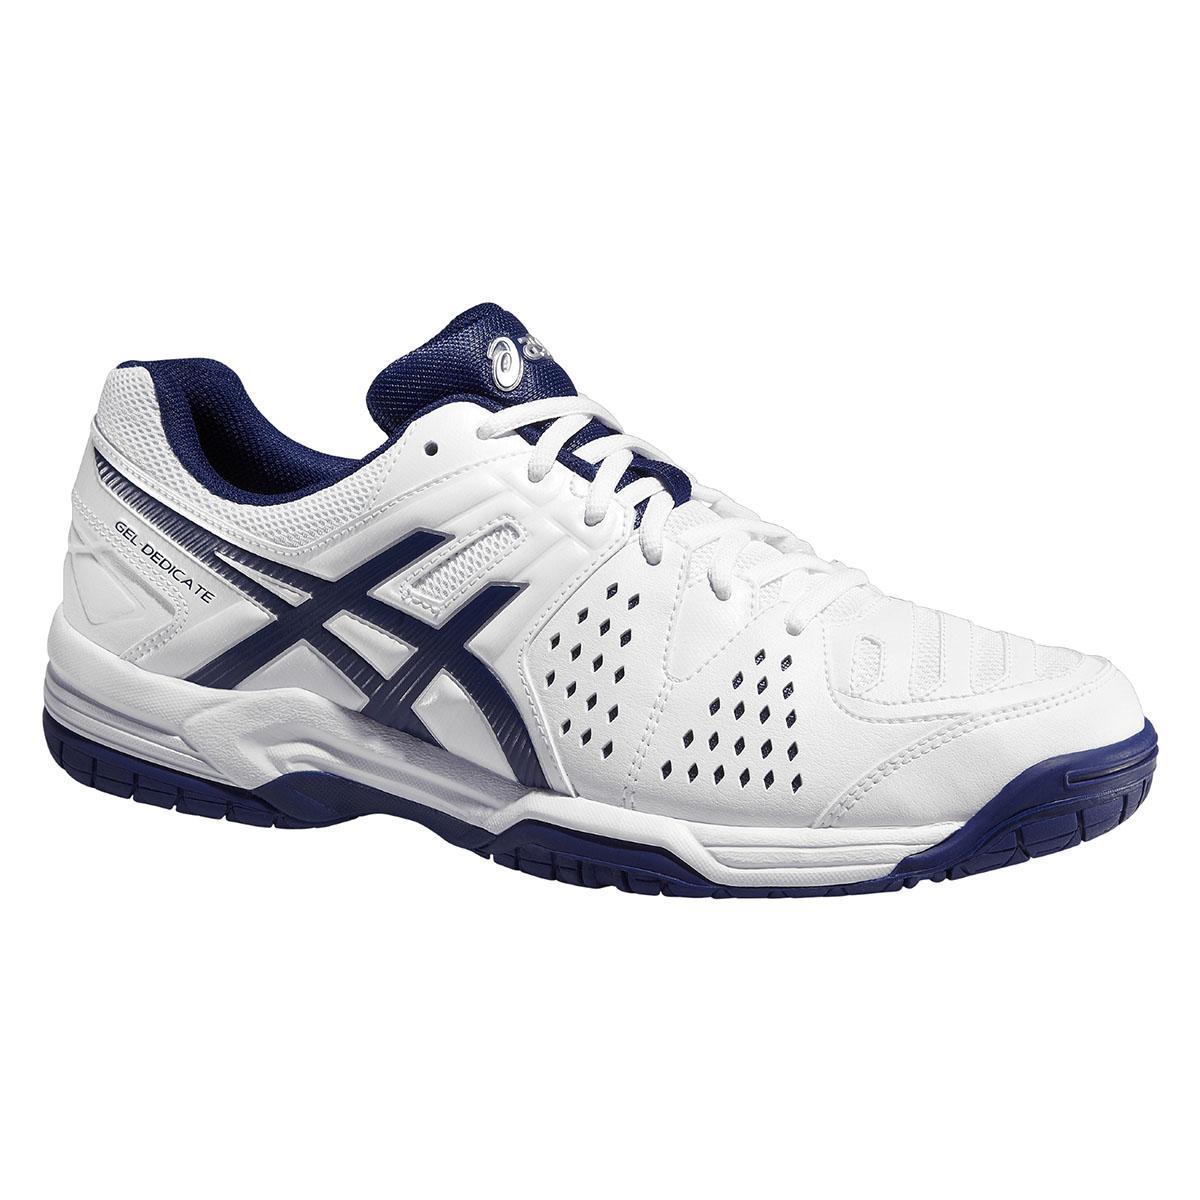 huge selection of 7b370 d5740 Asics Mens GEL-Dedicate 4 Tennis Shoes - White Navy - Tennisnuts.com